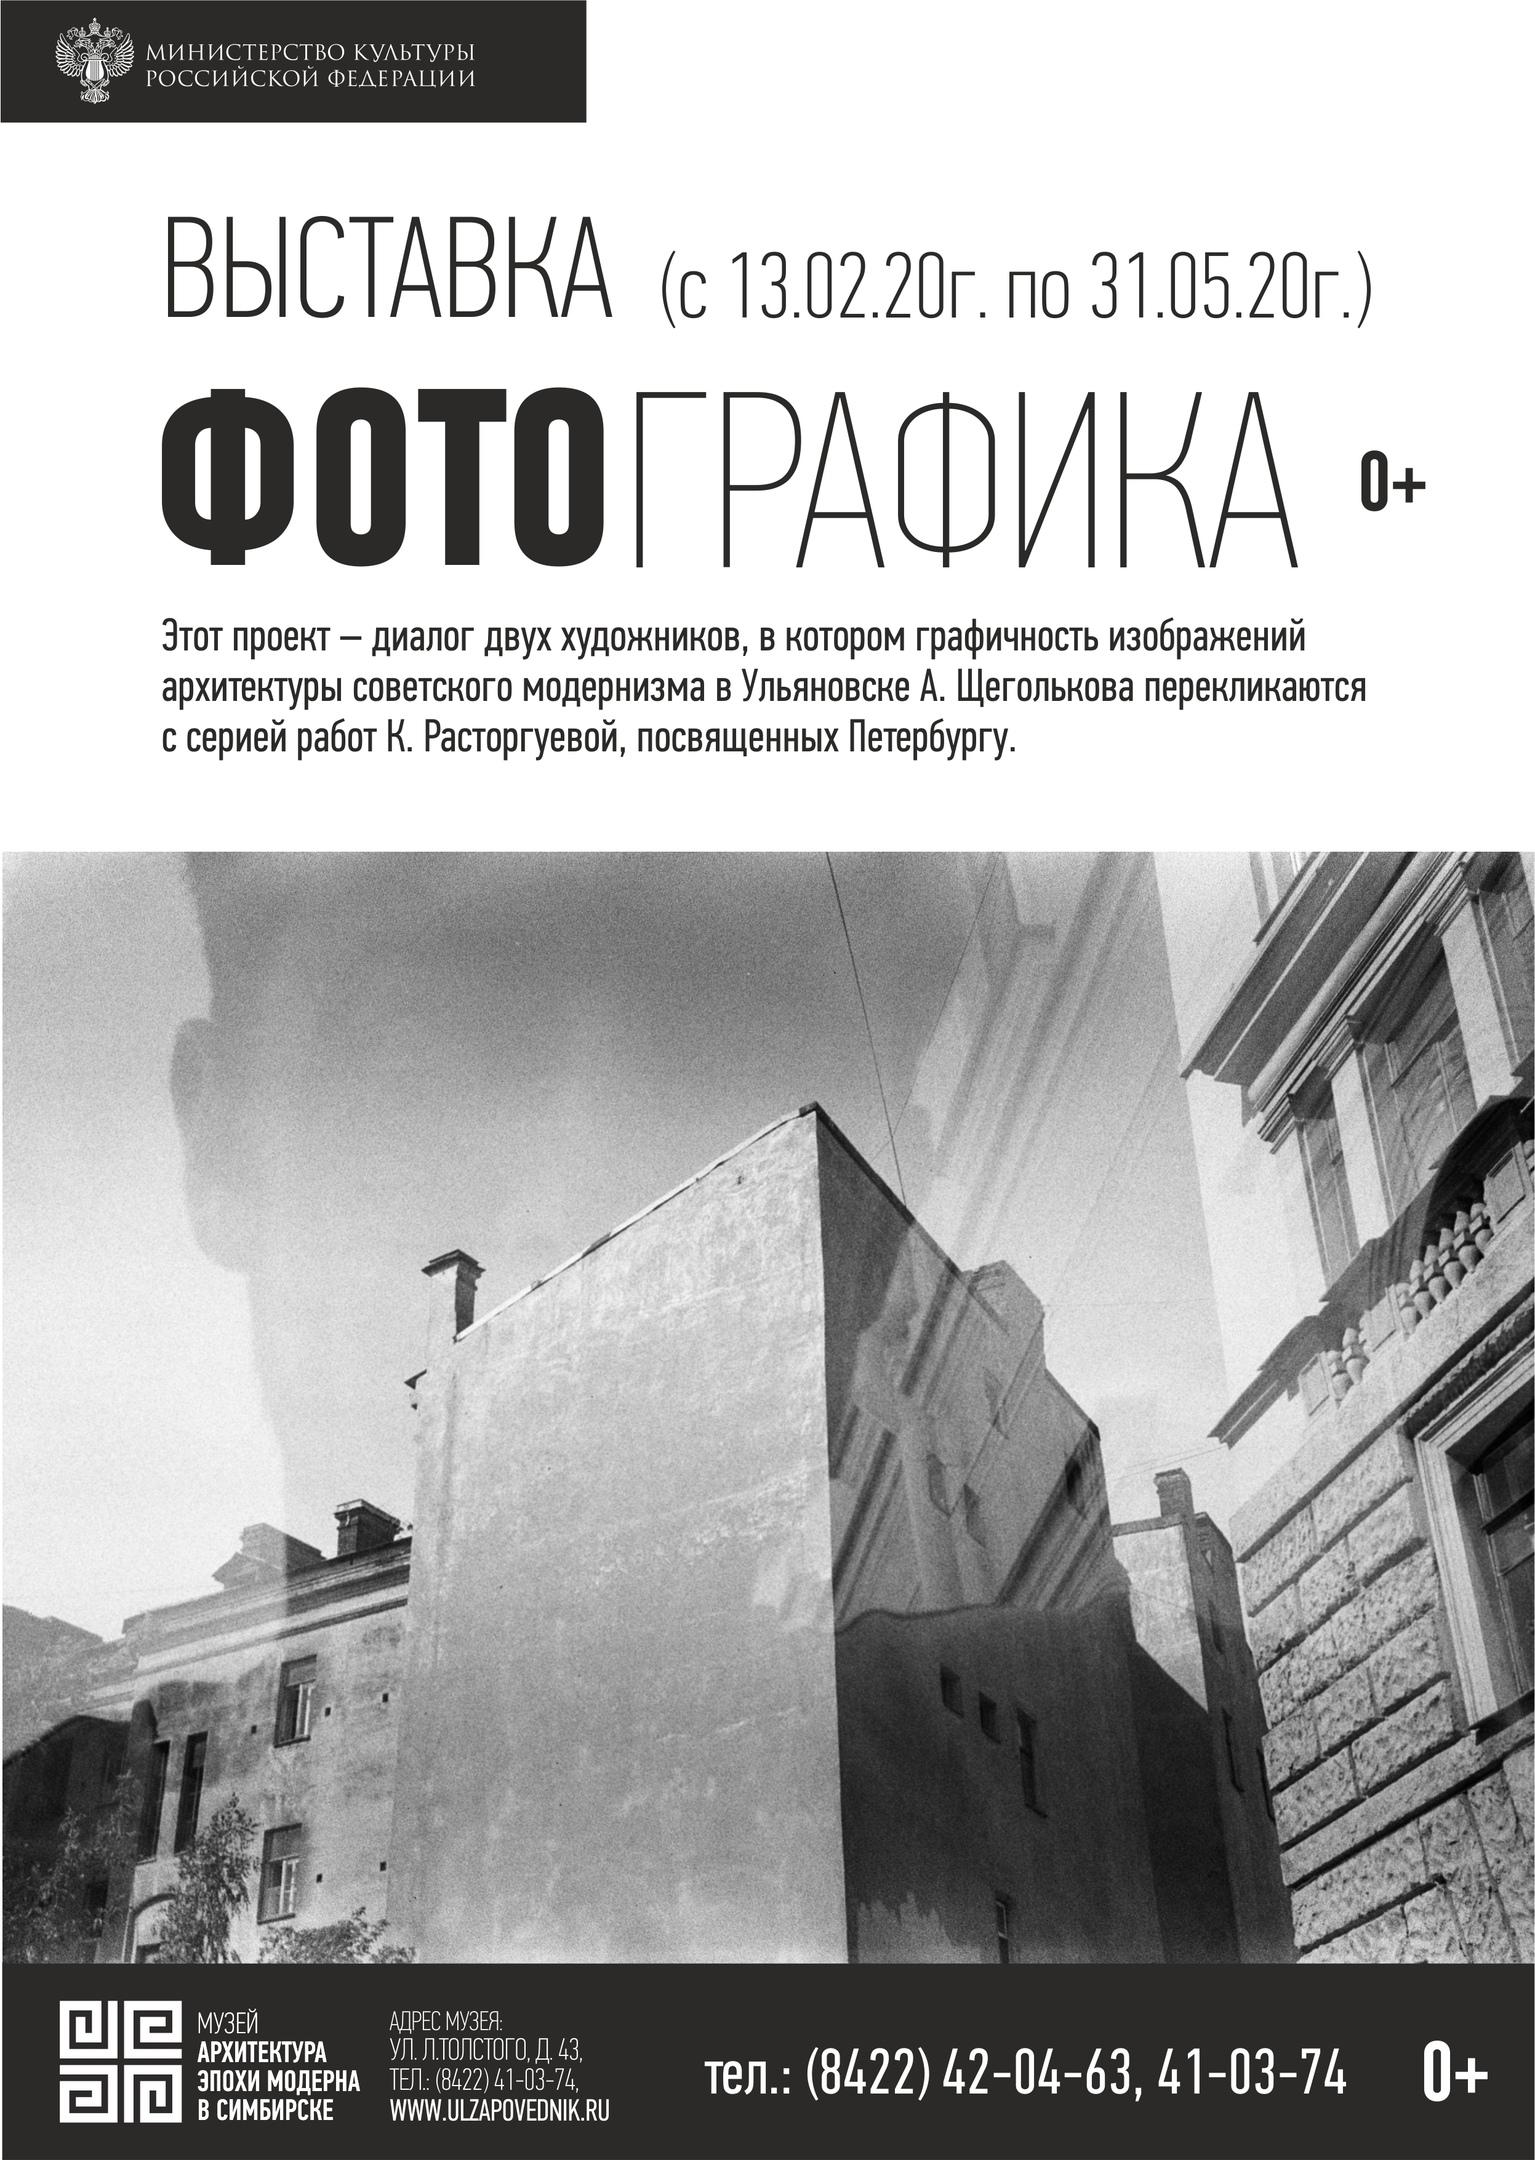 Выставка «ФотоГрафика» в музее «Архитектура эпохи модерна в Симбирске» @ в музее «Архитектура эпохи модерна в Симбирске» (ул.Ленина, д. 98)